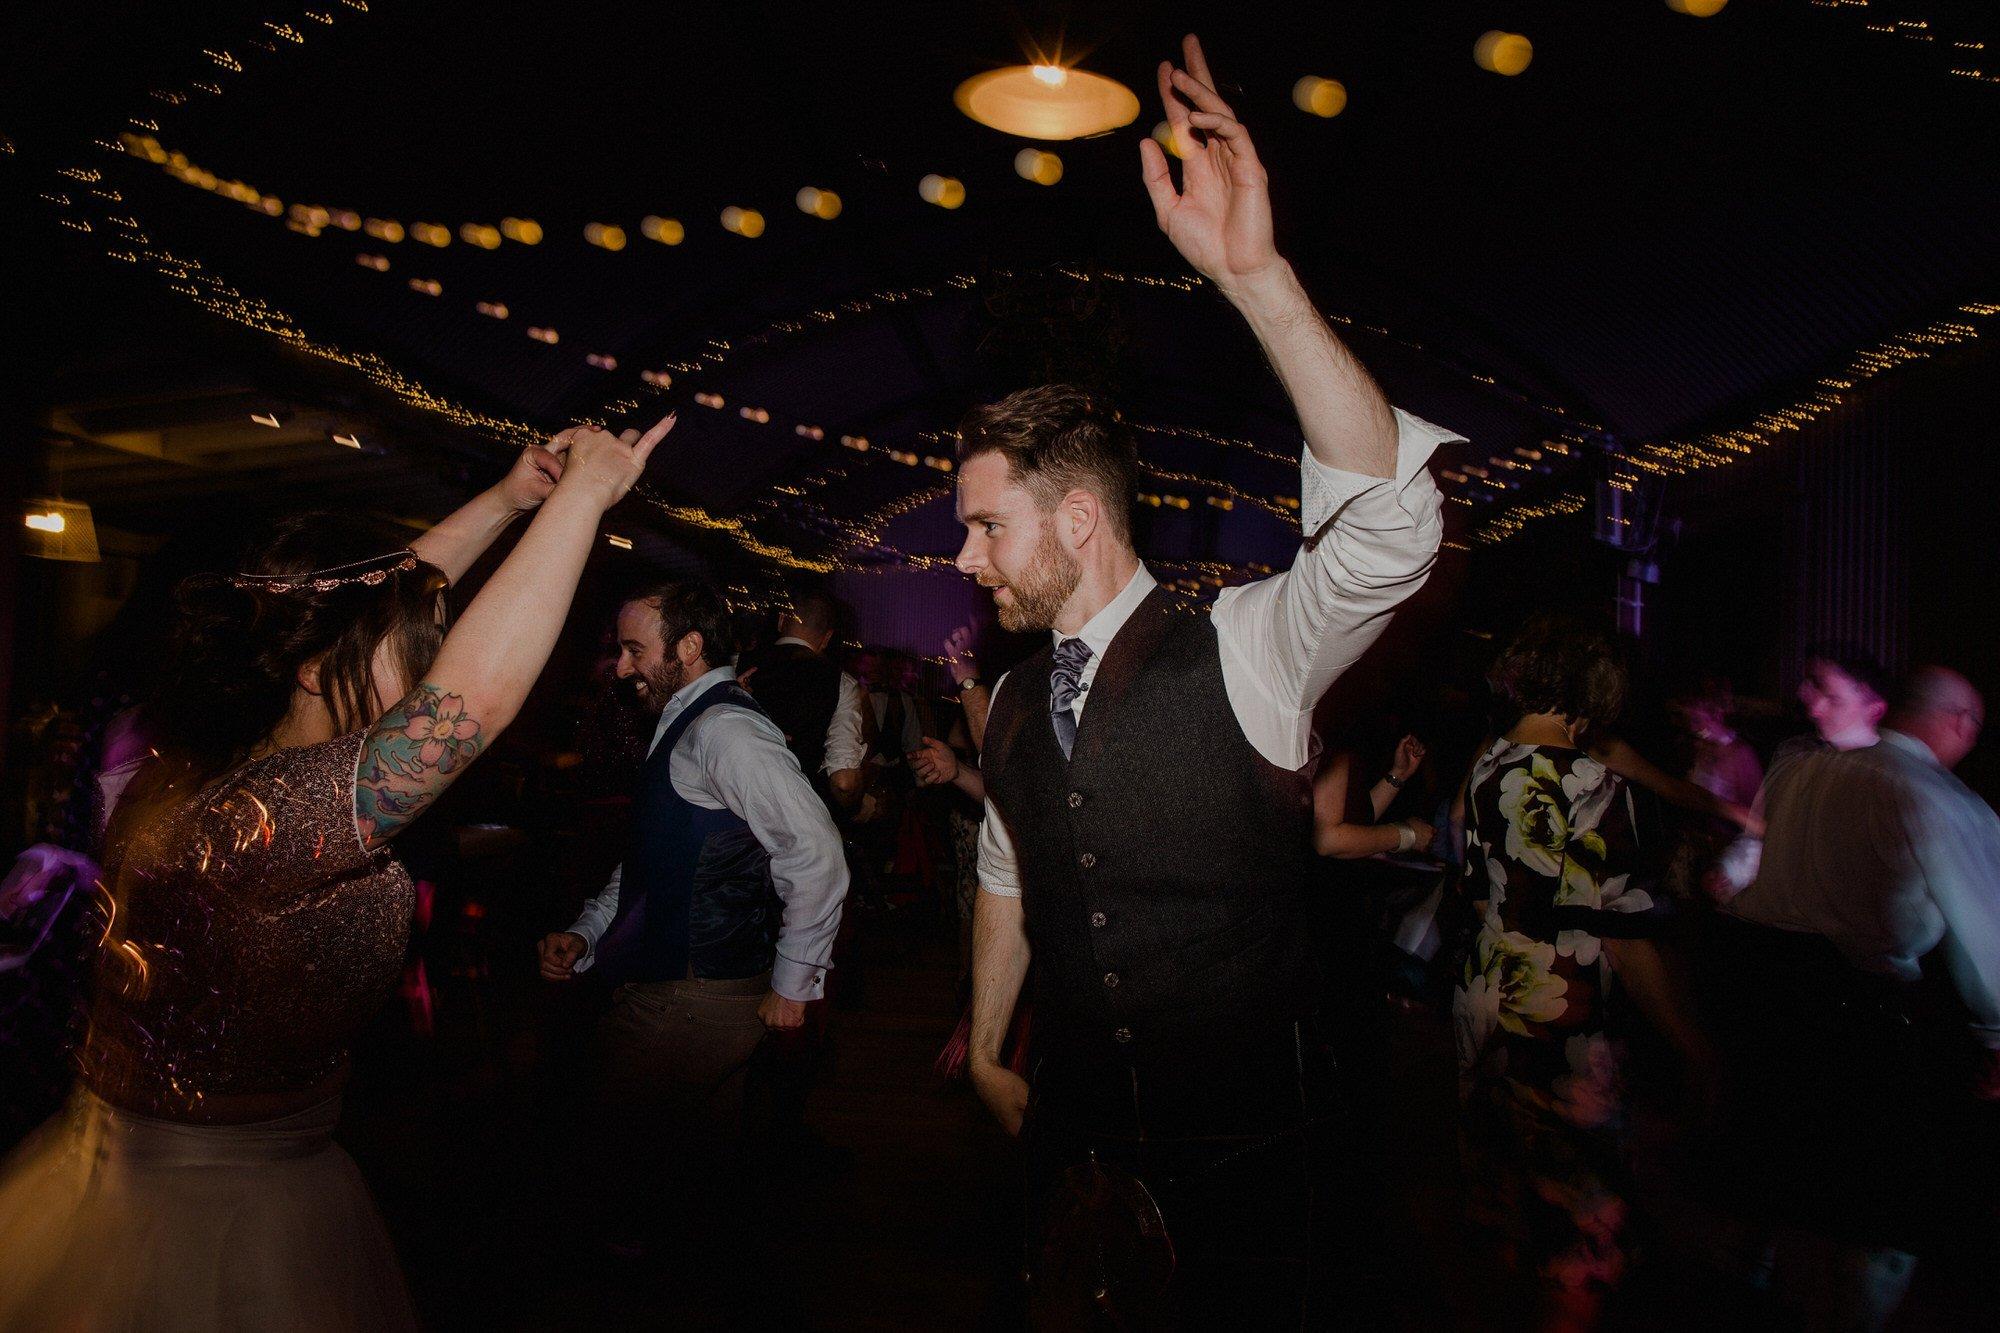 077 TIN SHED KNOCKRAICH FARM WEDDING ALTERNATIVE BRIDE ZOE ALEXANDRA PHOTOGRAPHY